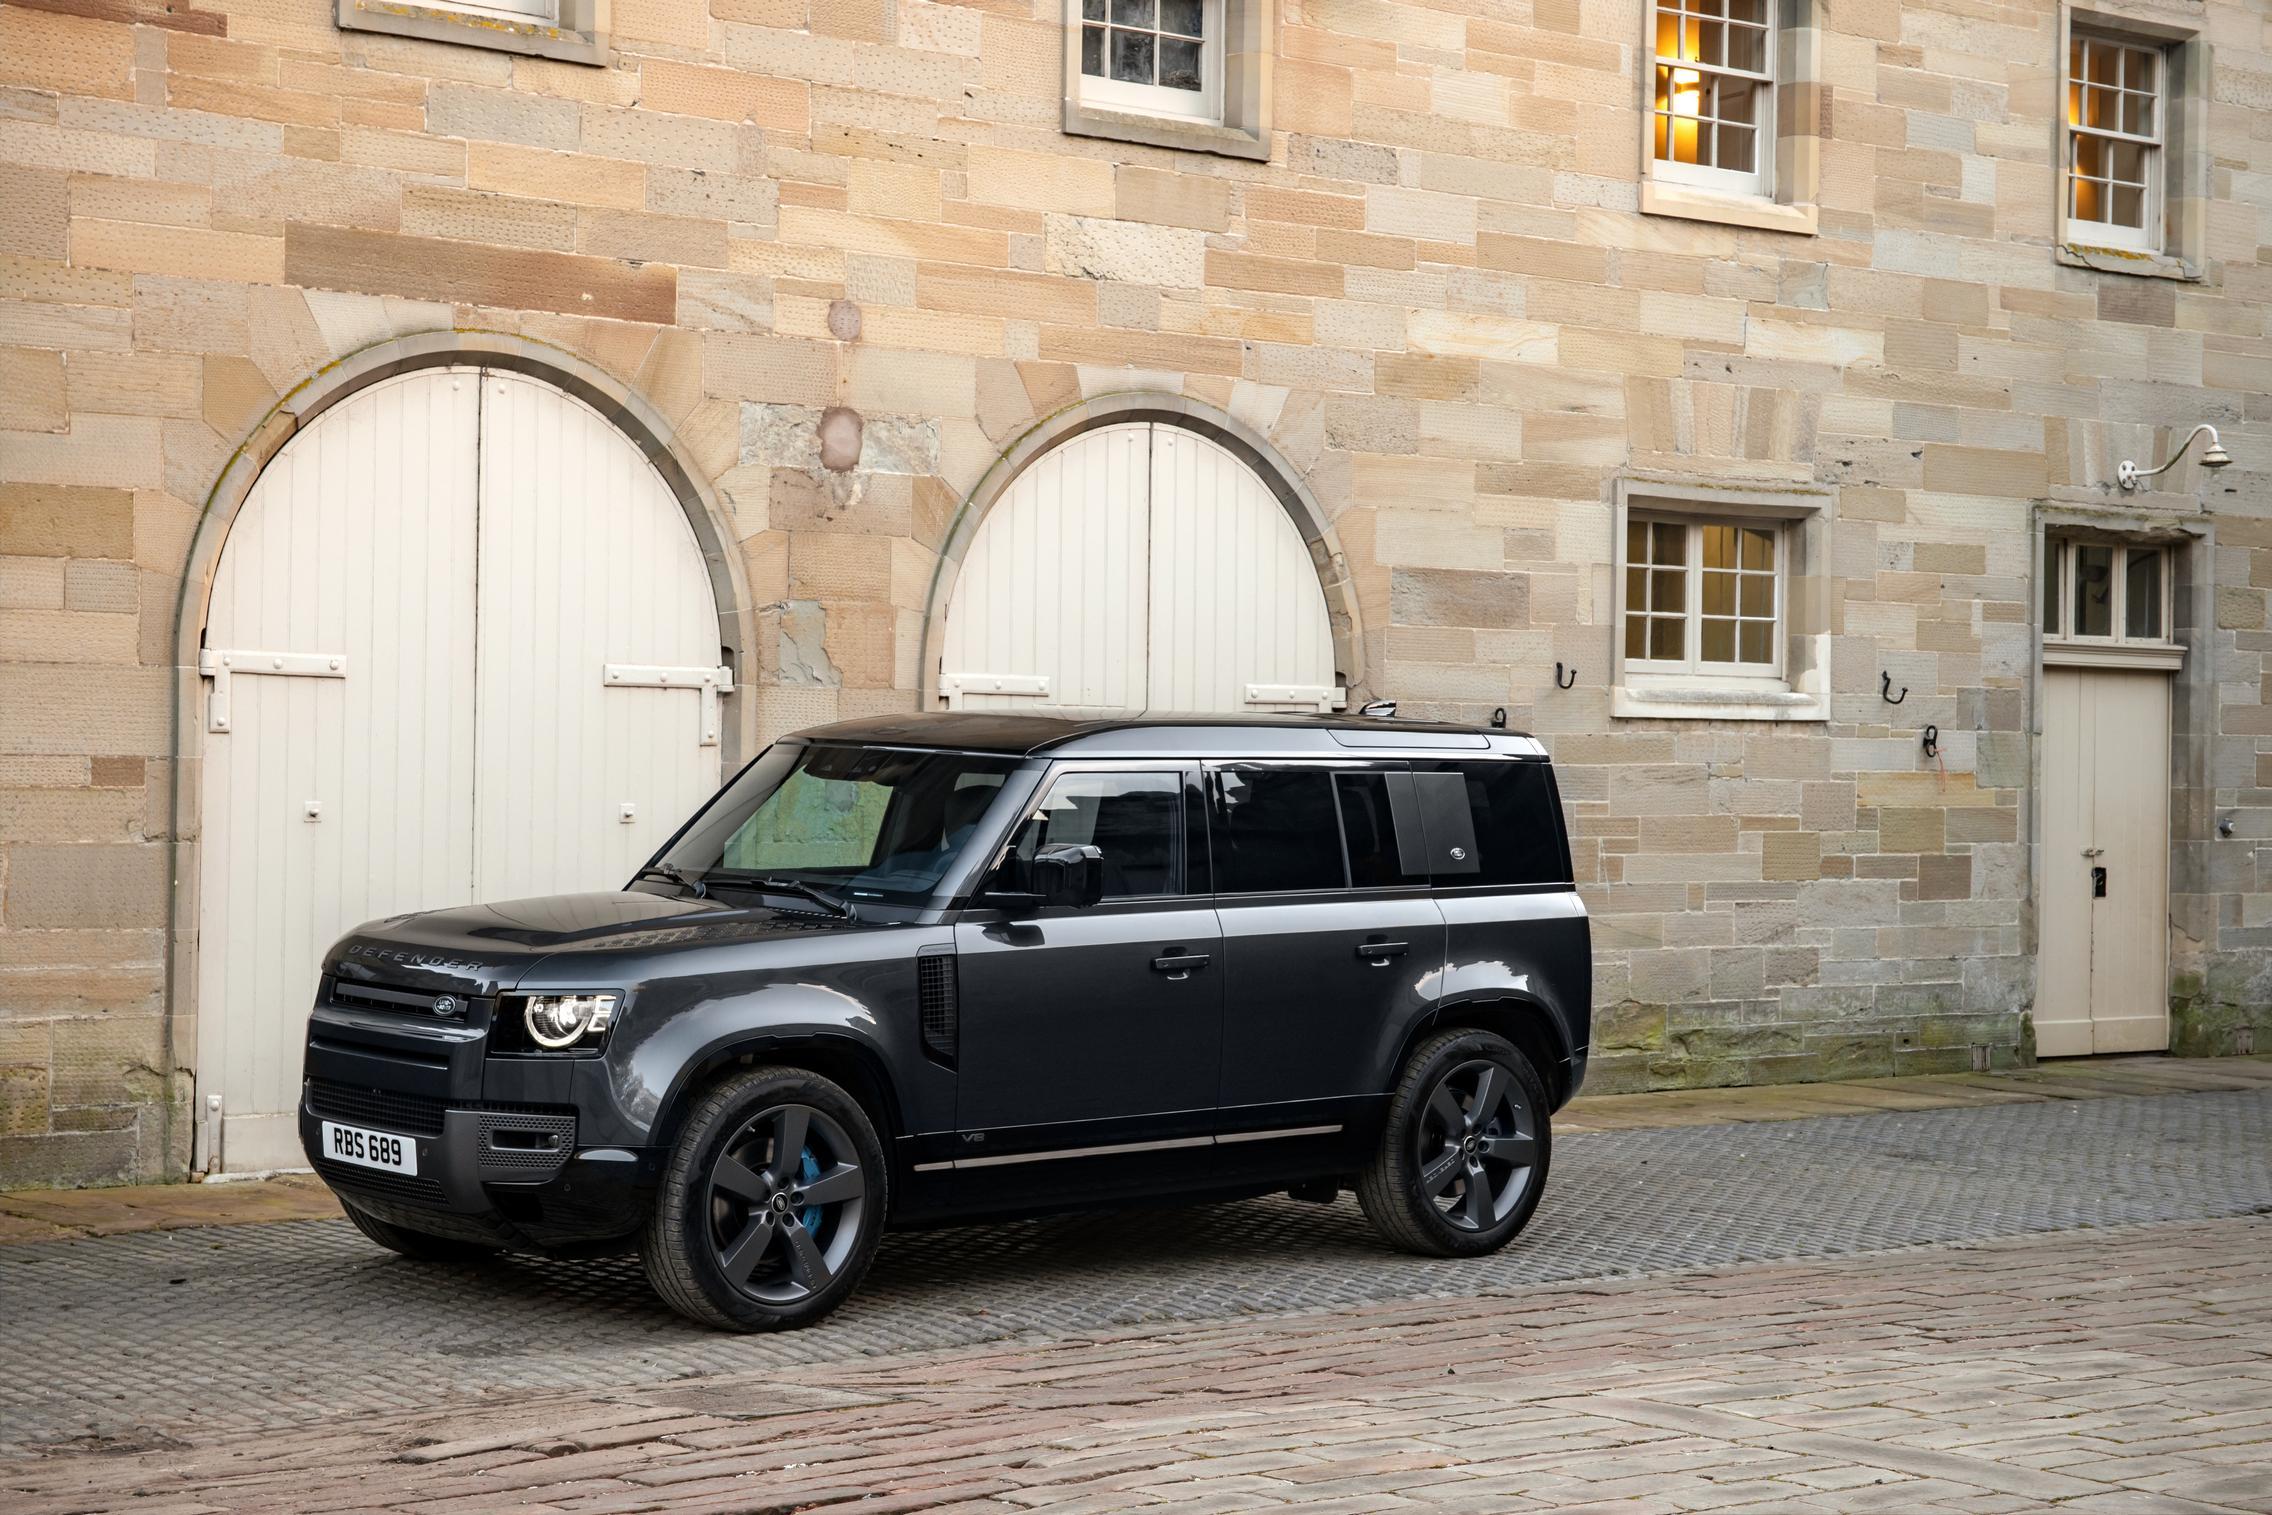 Land Rover Defender 110 V8 price